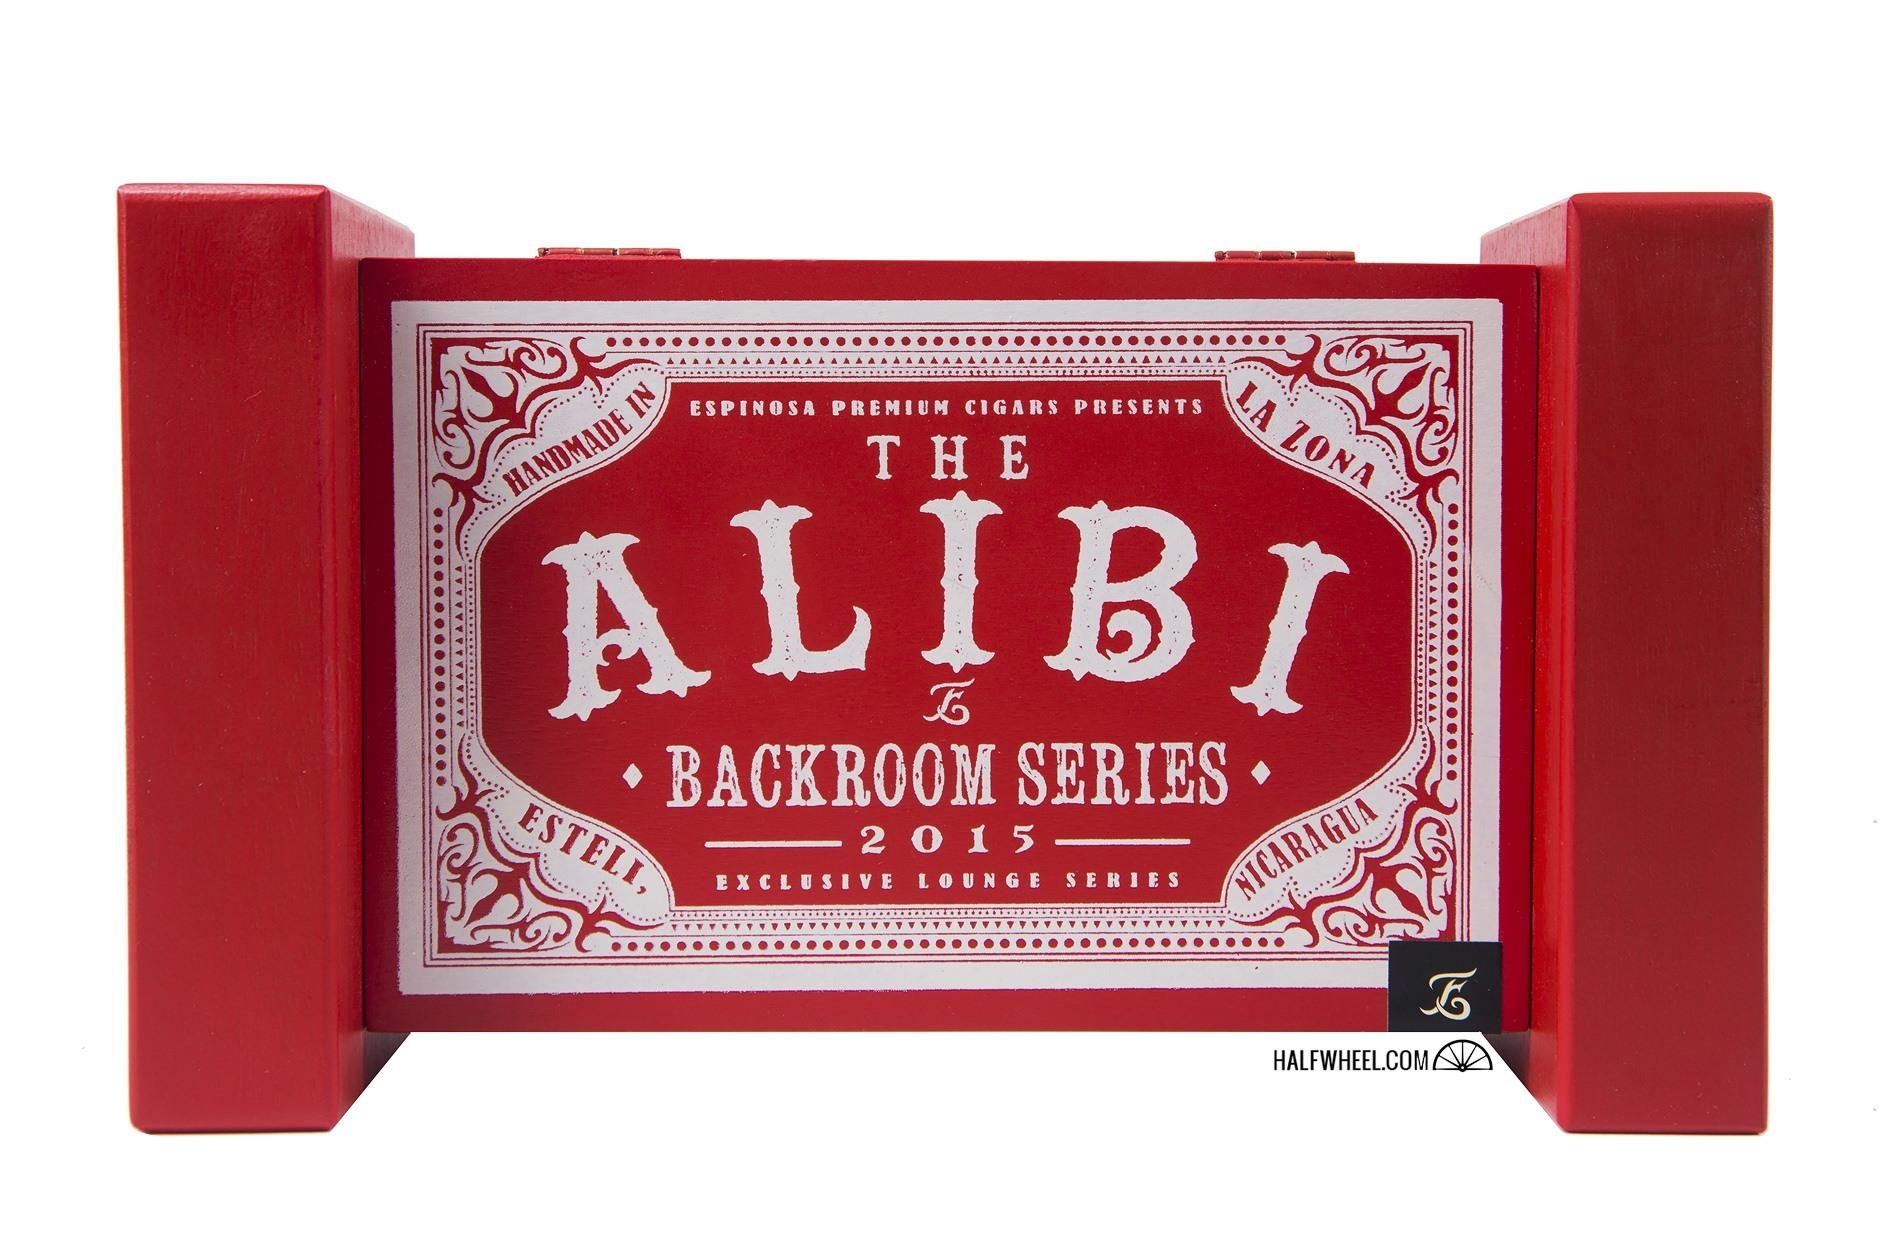 Espinosa The Alibi Box 1